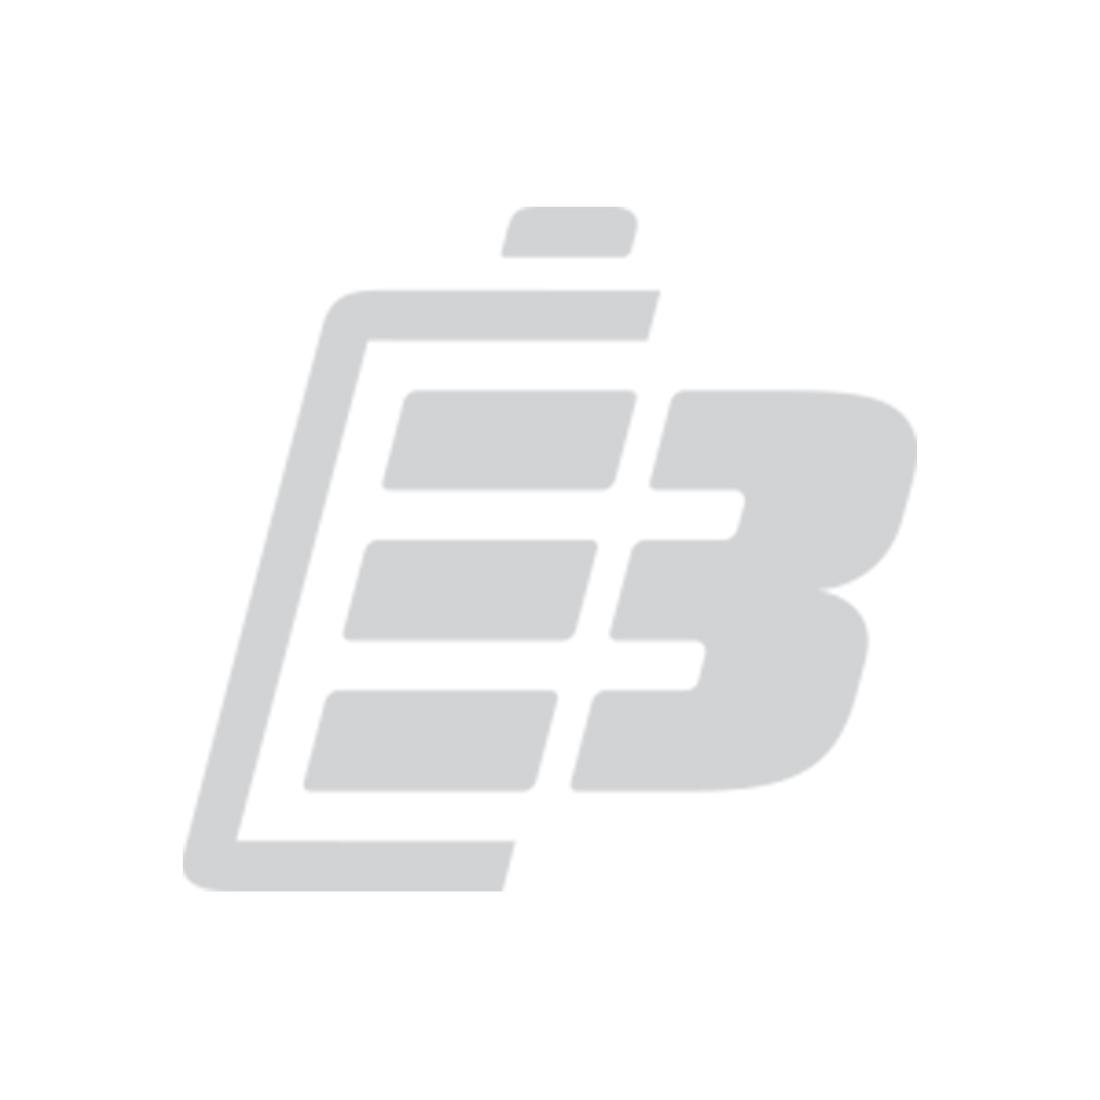 Fenix TK72R LED flashlight 1